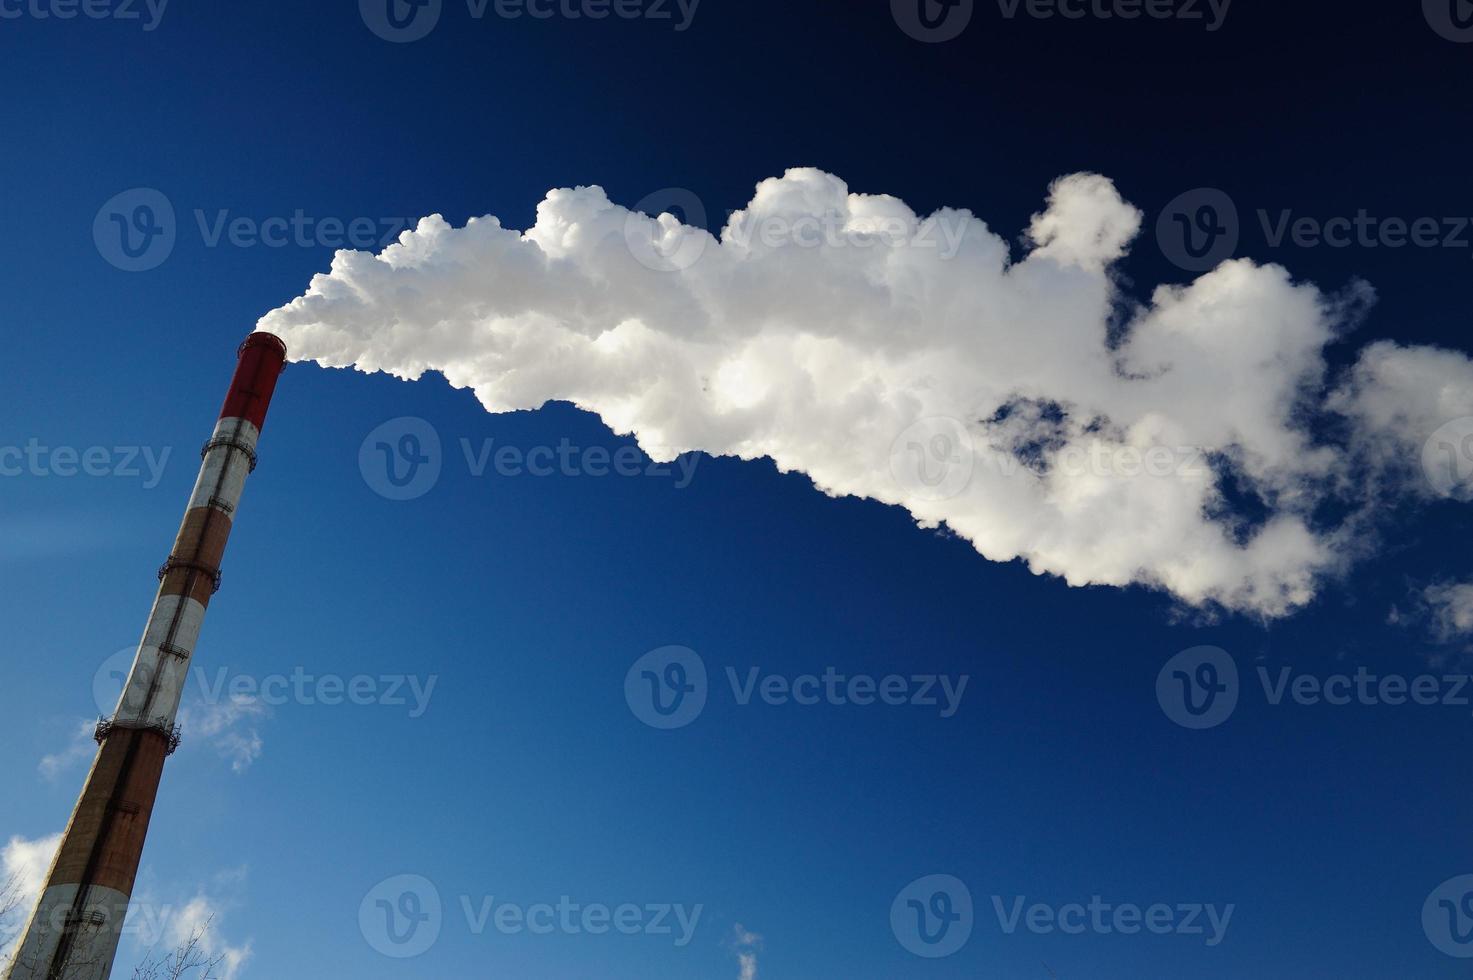 stoom-hitte pijp in blauwe hemel foto